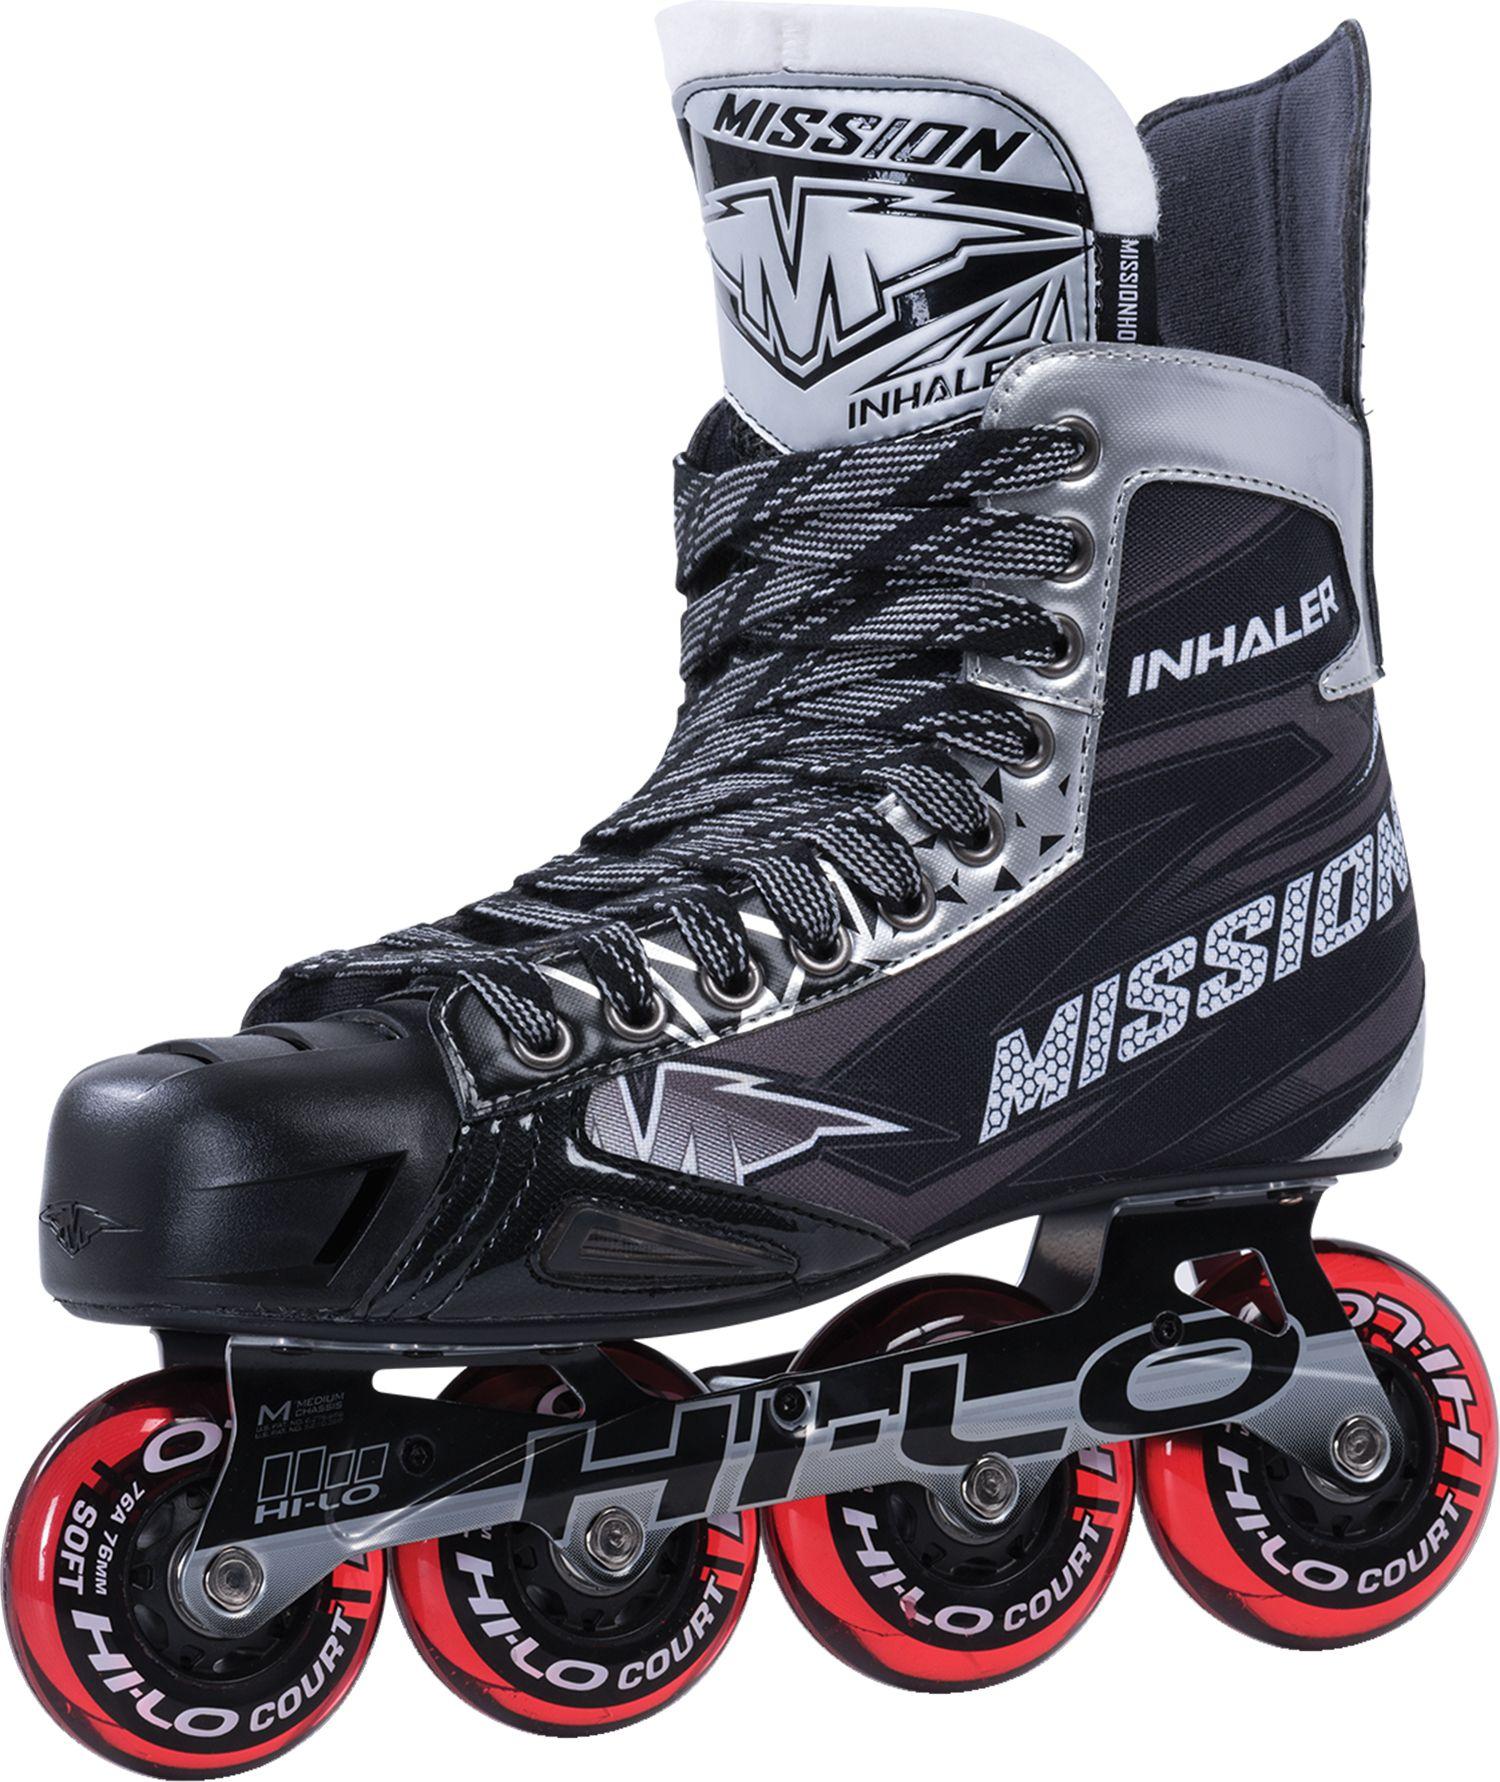 Roller skating visalia - Product Image Mission Junior Inhaler Nls5 Roller Hockey Skates